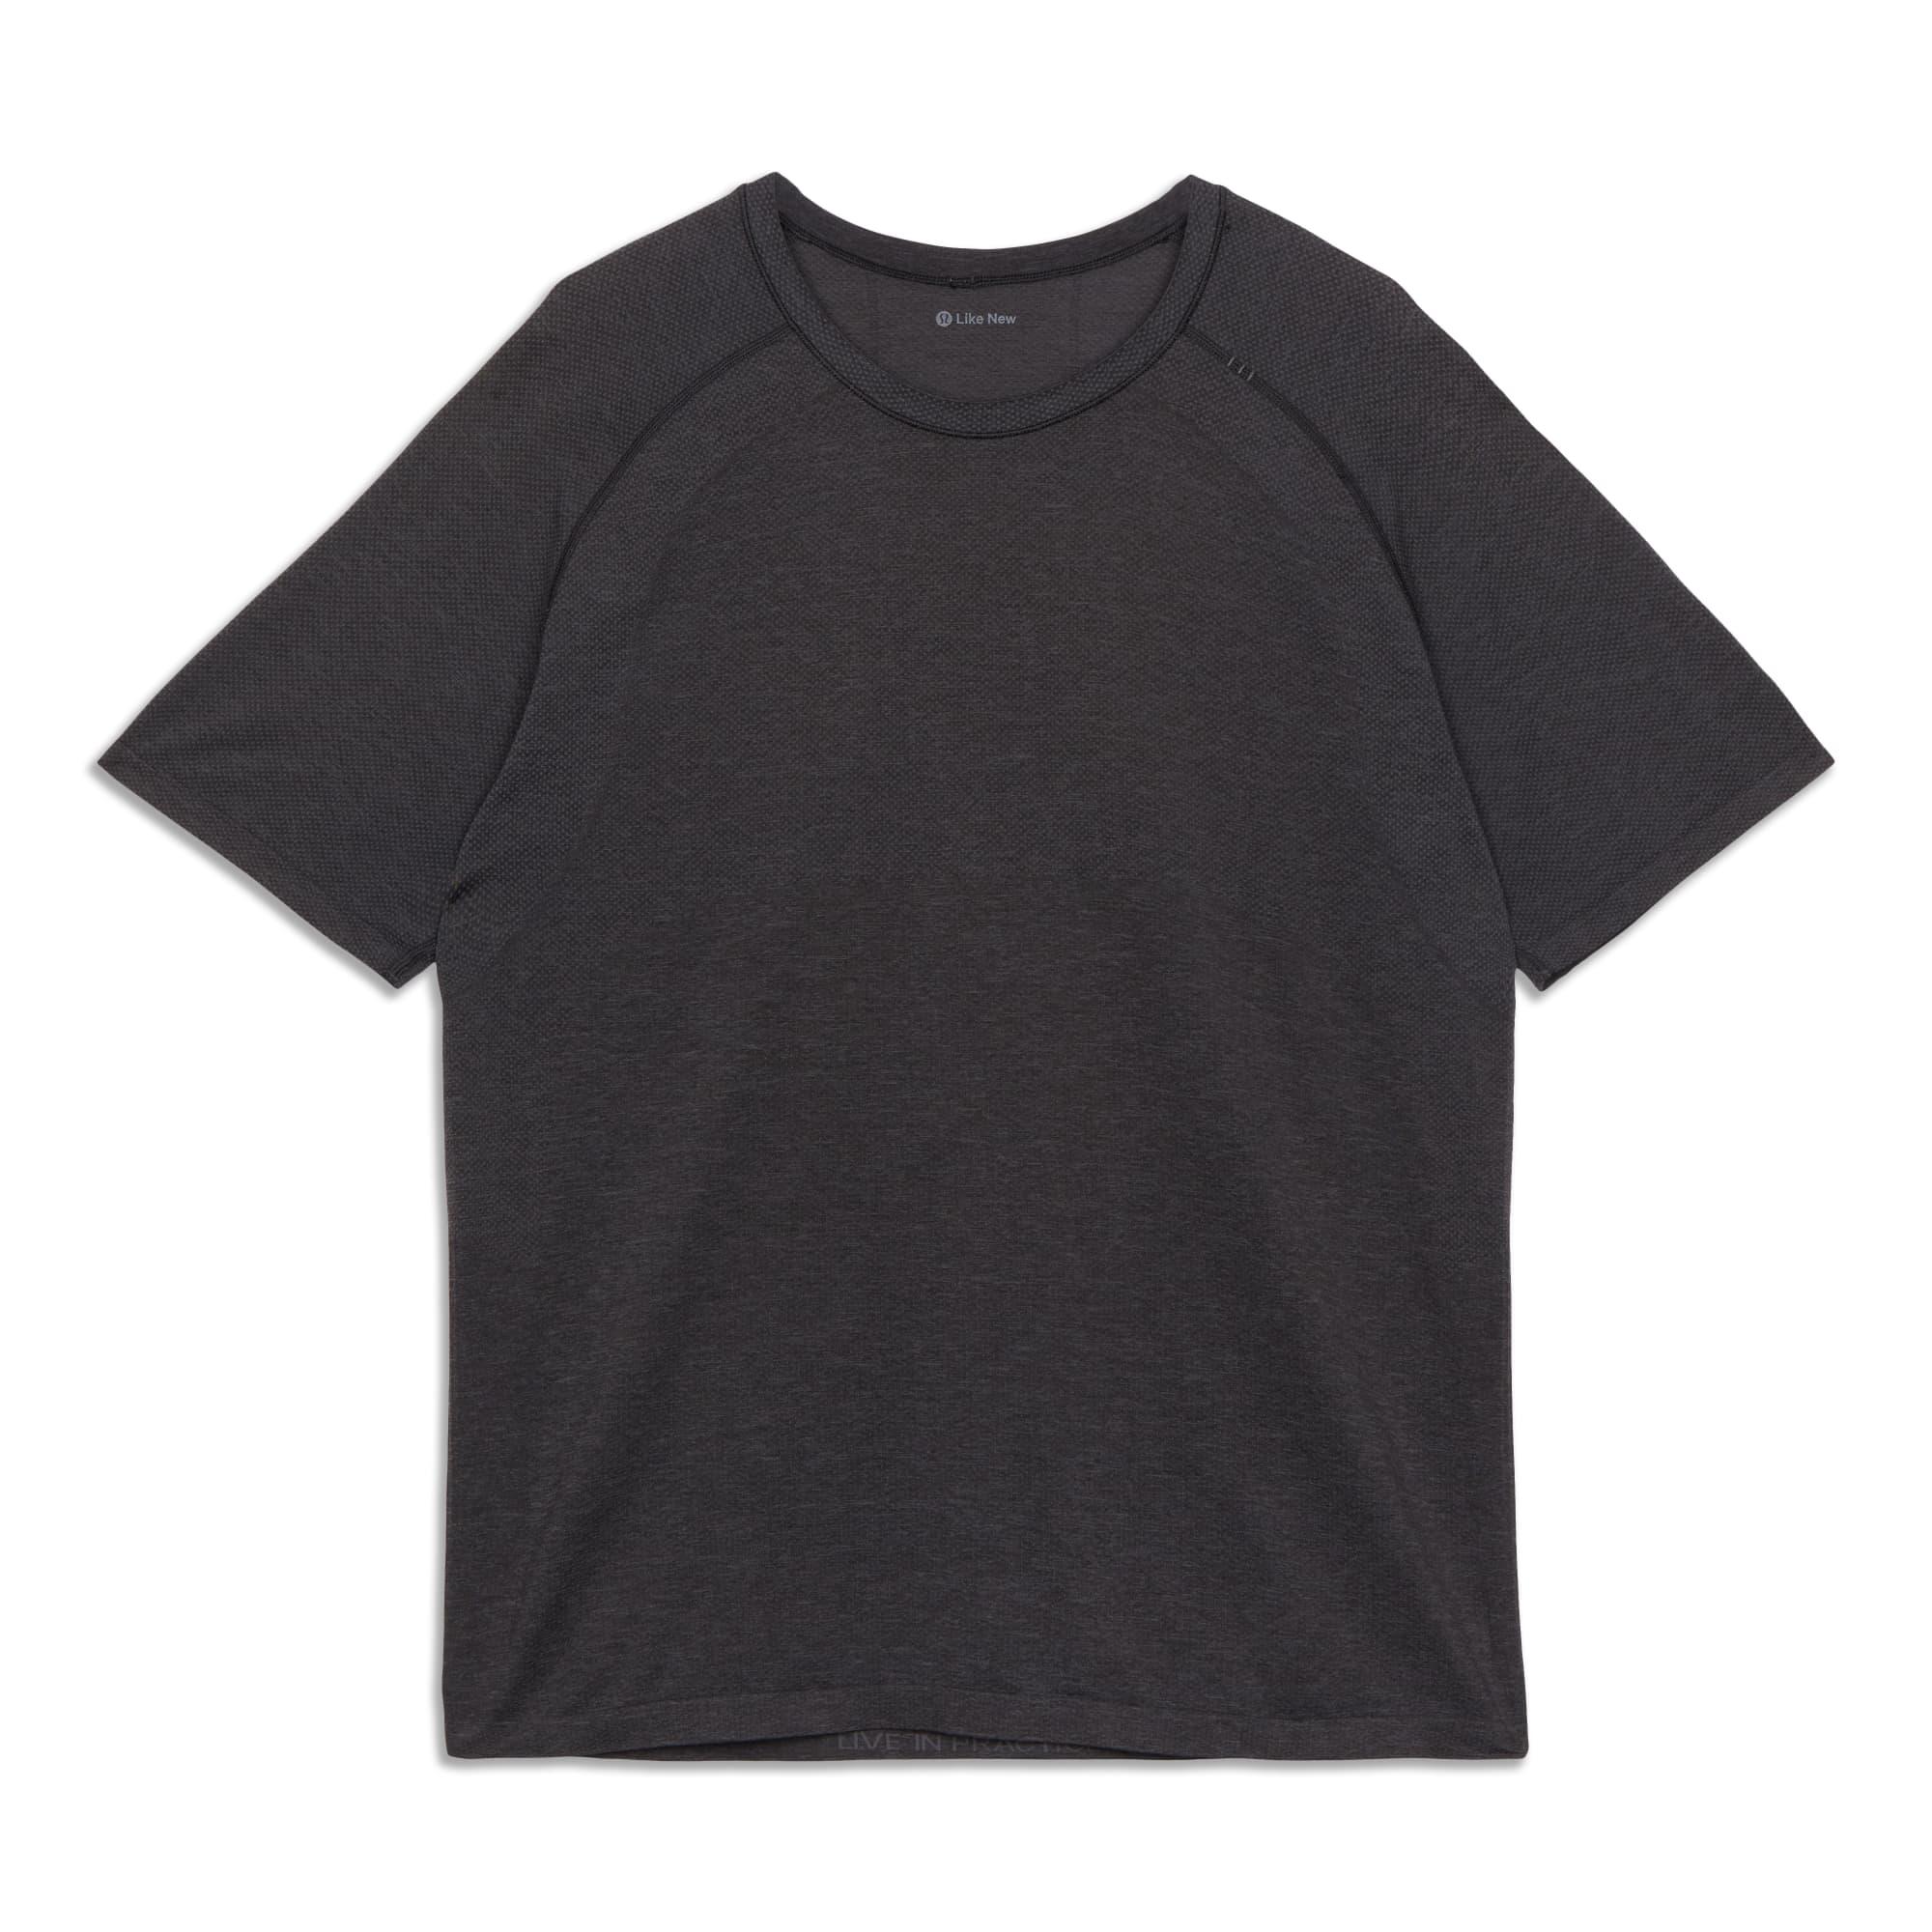 Main product image: Metal Vent Tech Short Sleeve Shirt - Resale